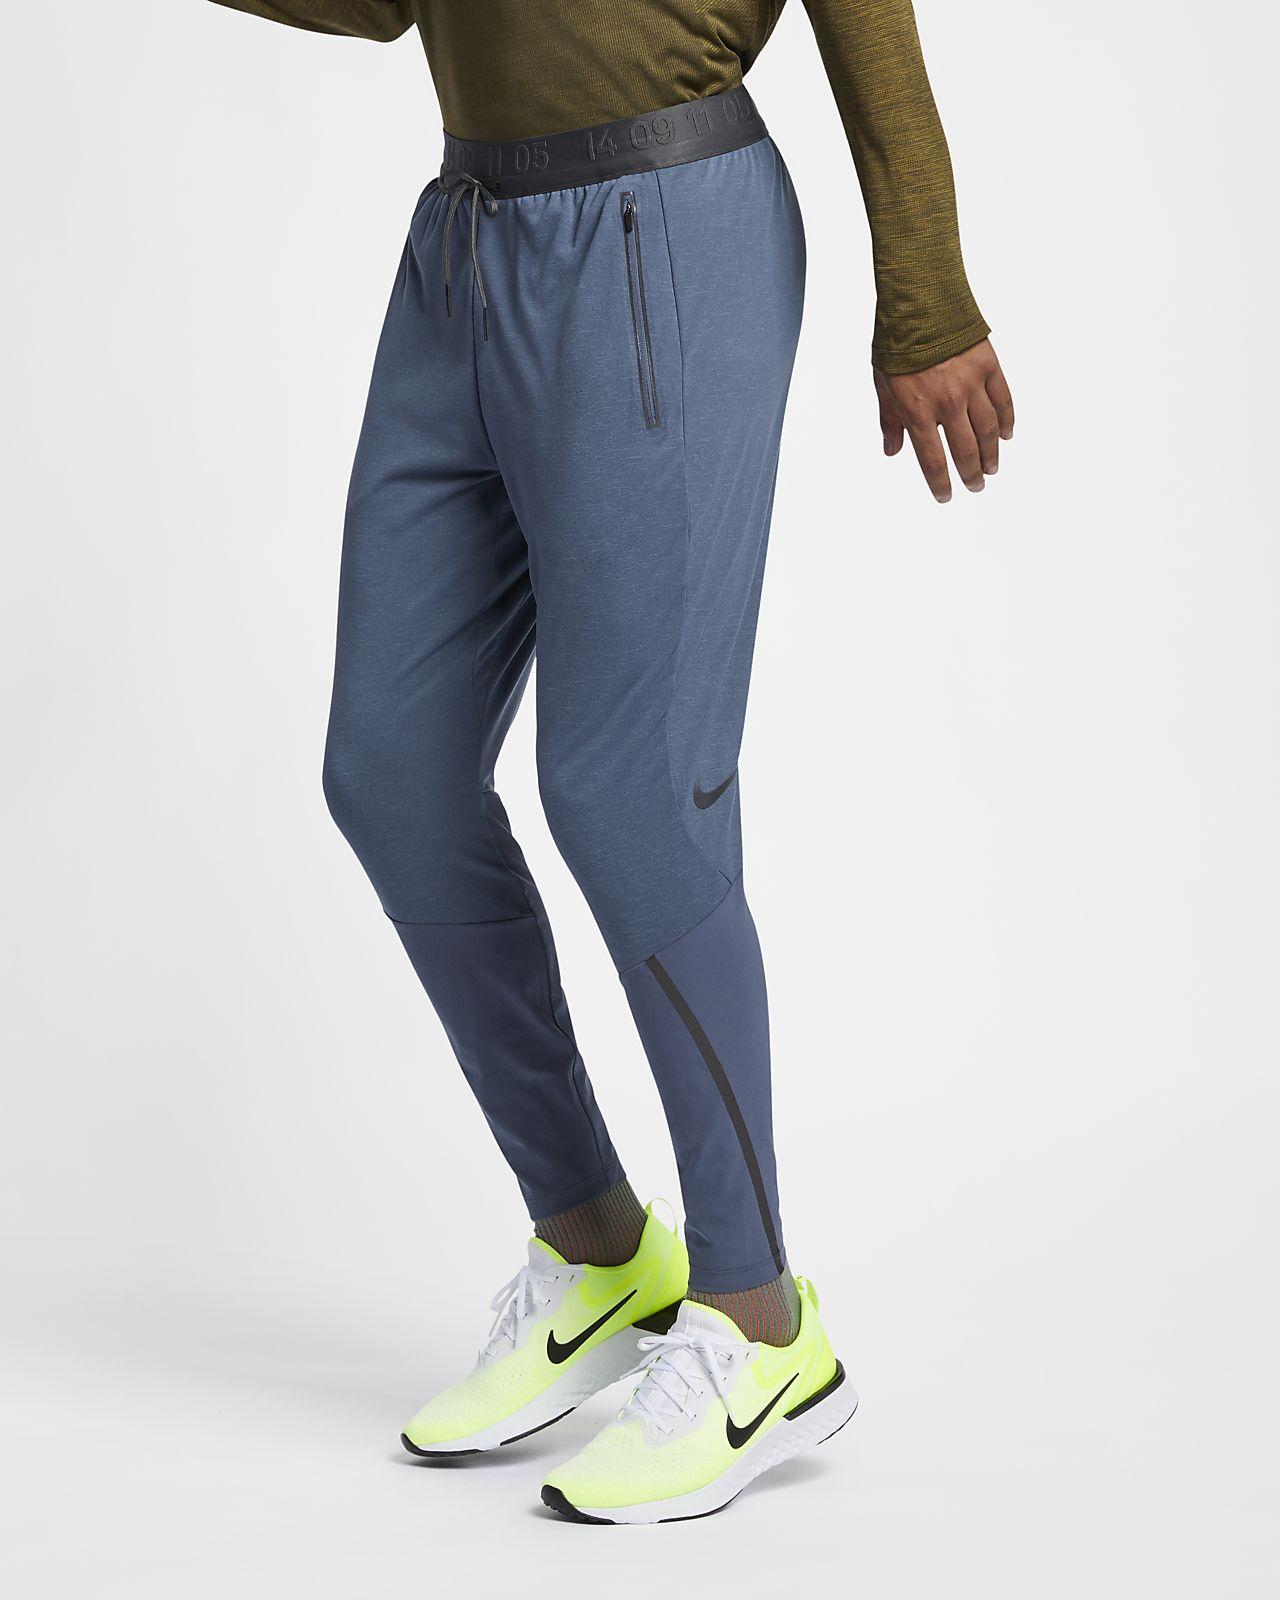 2c1223585dc8 Nike Therma-Sphere Tech Pack Men s Running Trousers. Nike.com CA